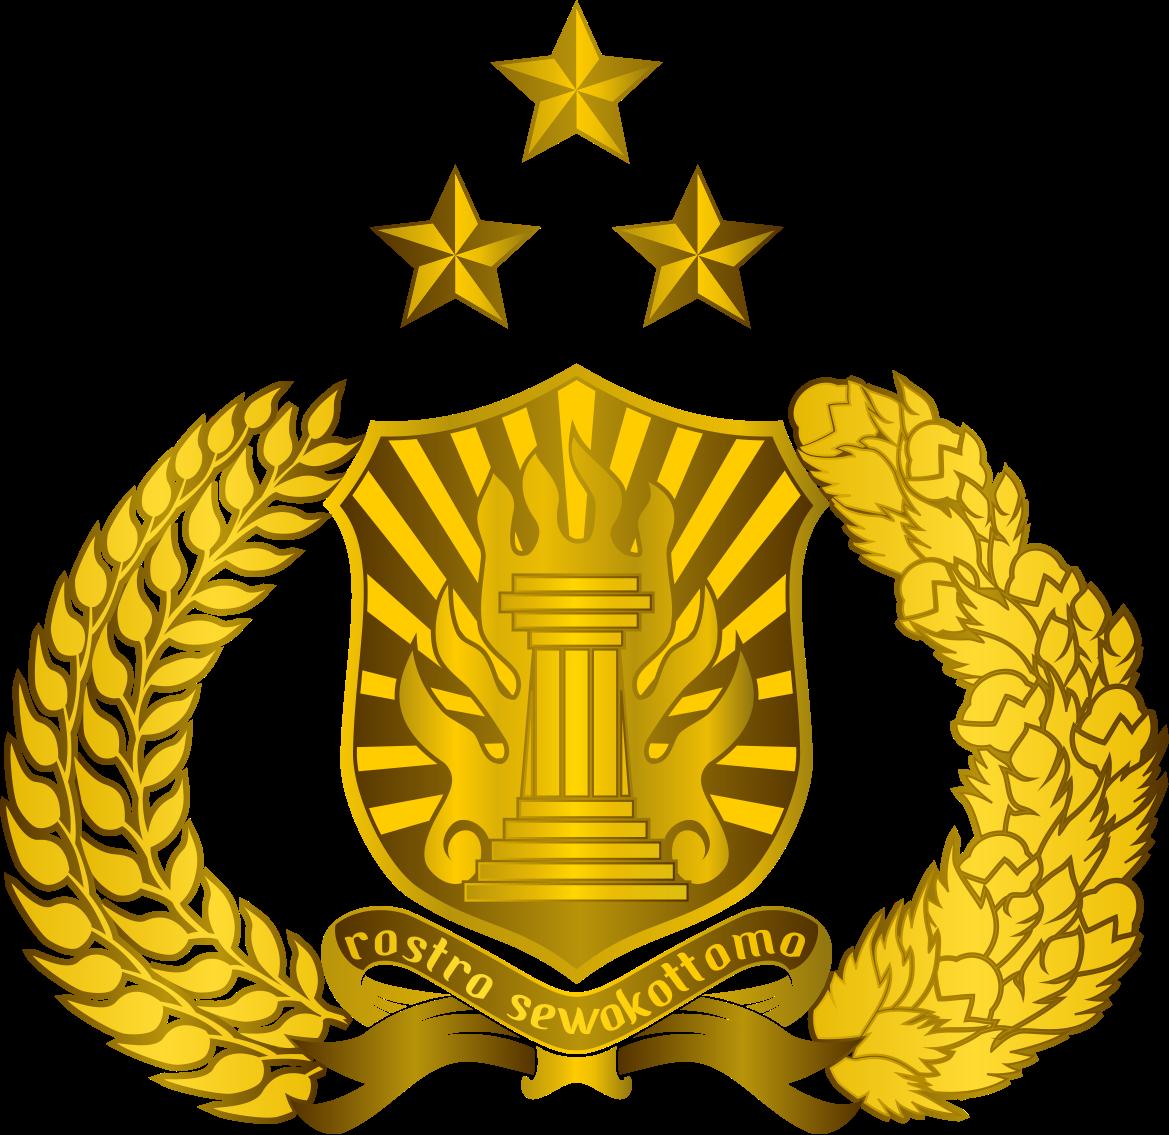 Lambang Tribrata Polri Polisi Republik Indonesia